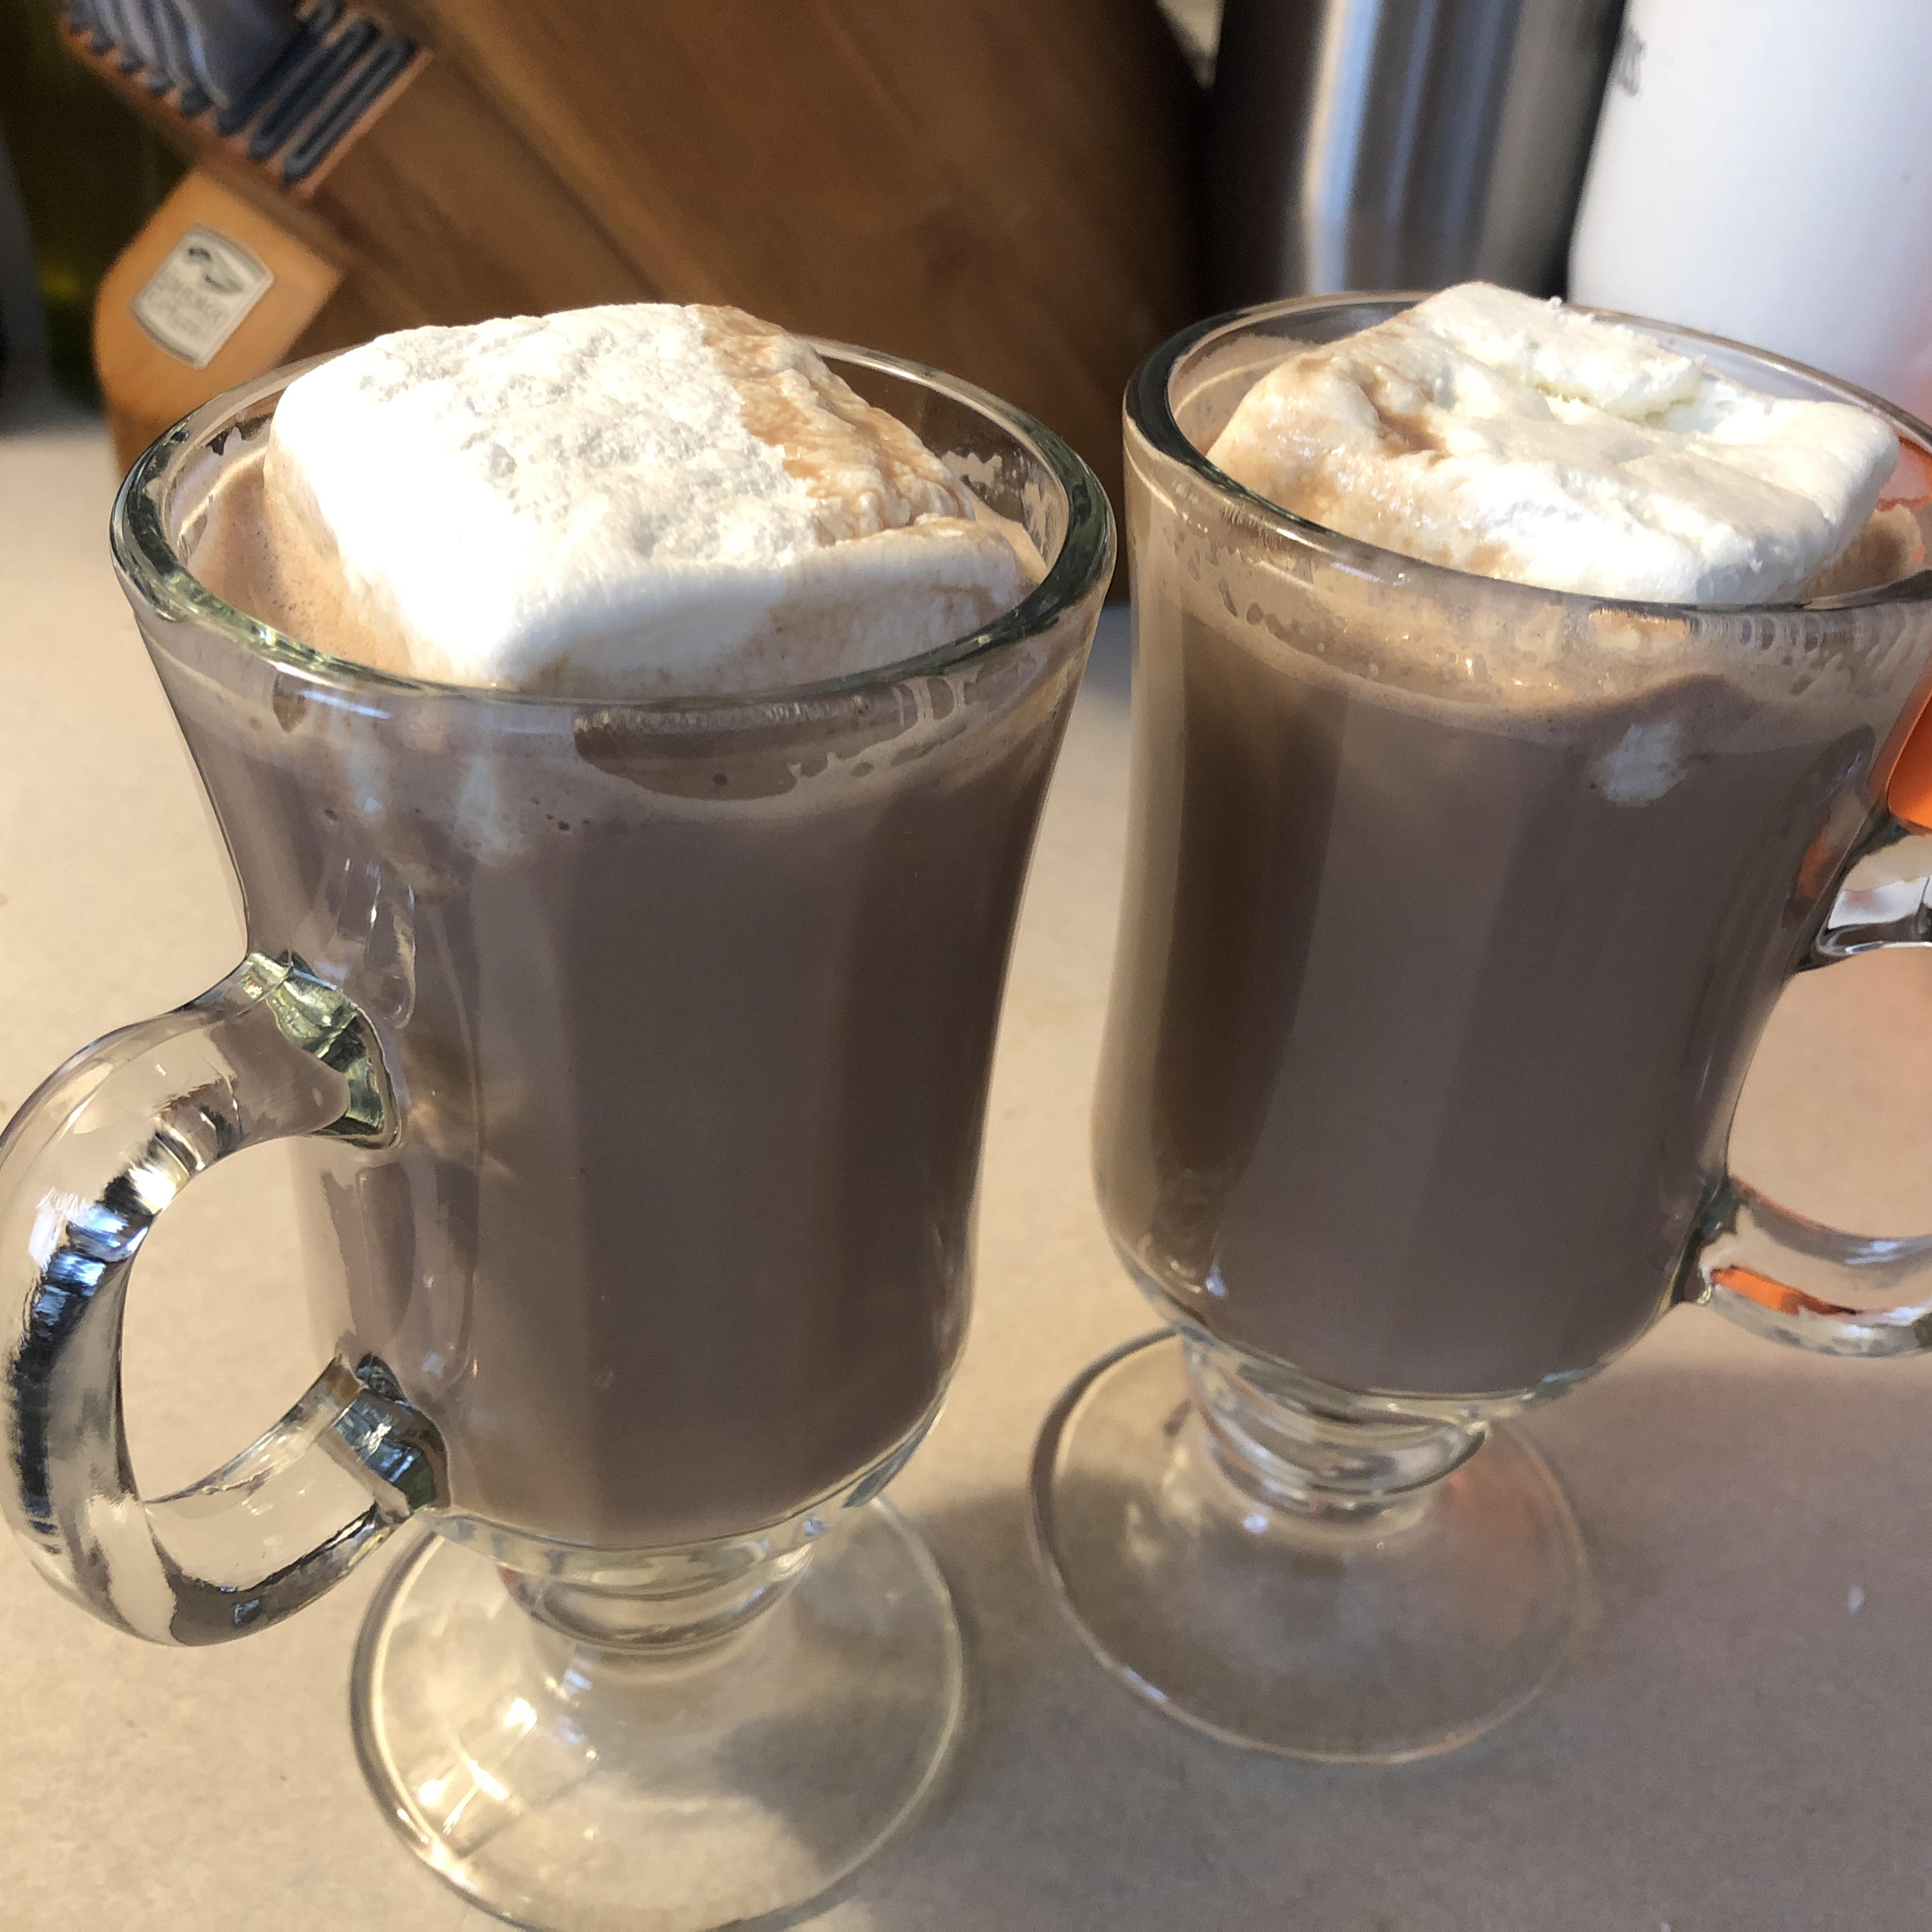 Healthy Hot Cocoa Angelic7447